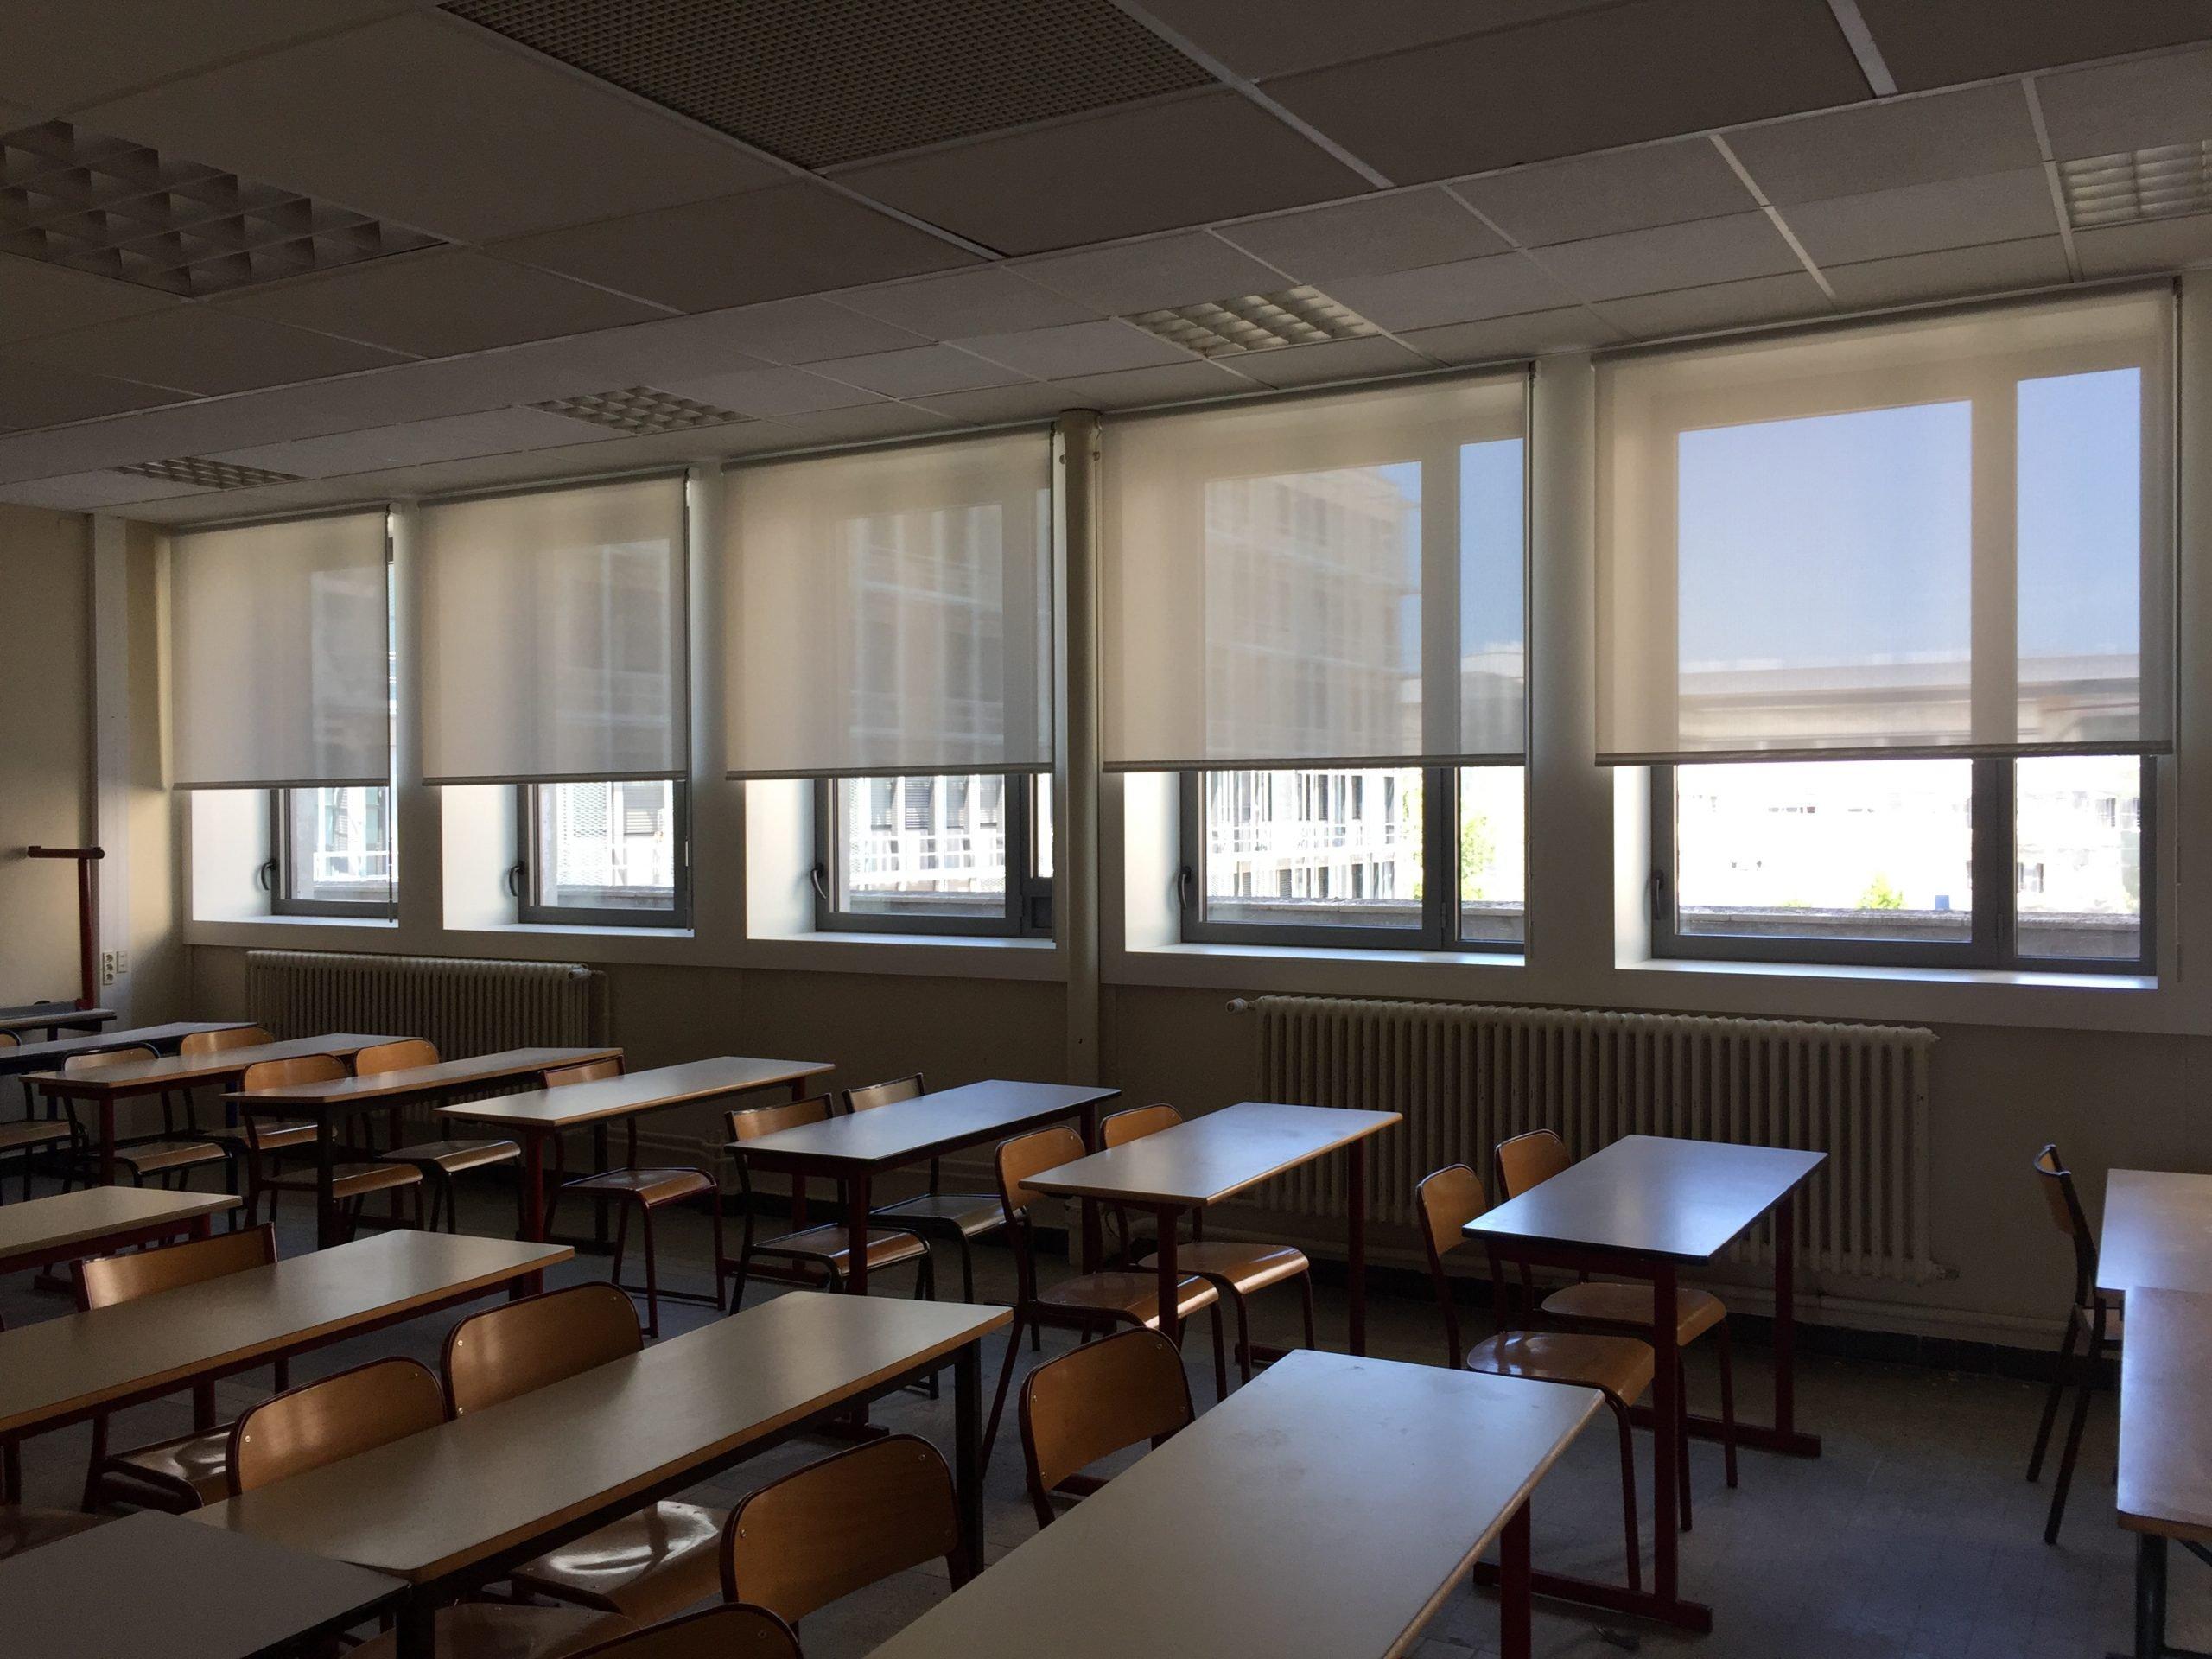 Universidad pública Francia